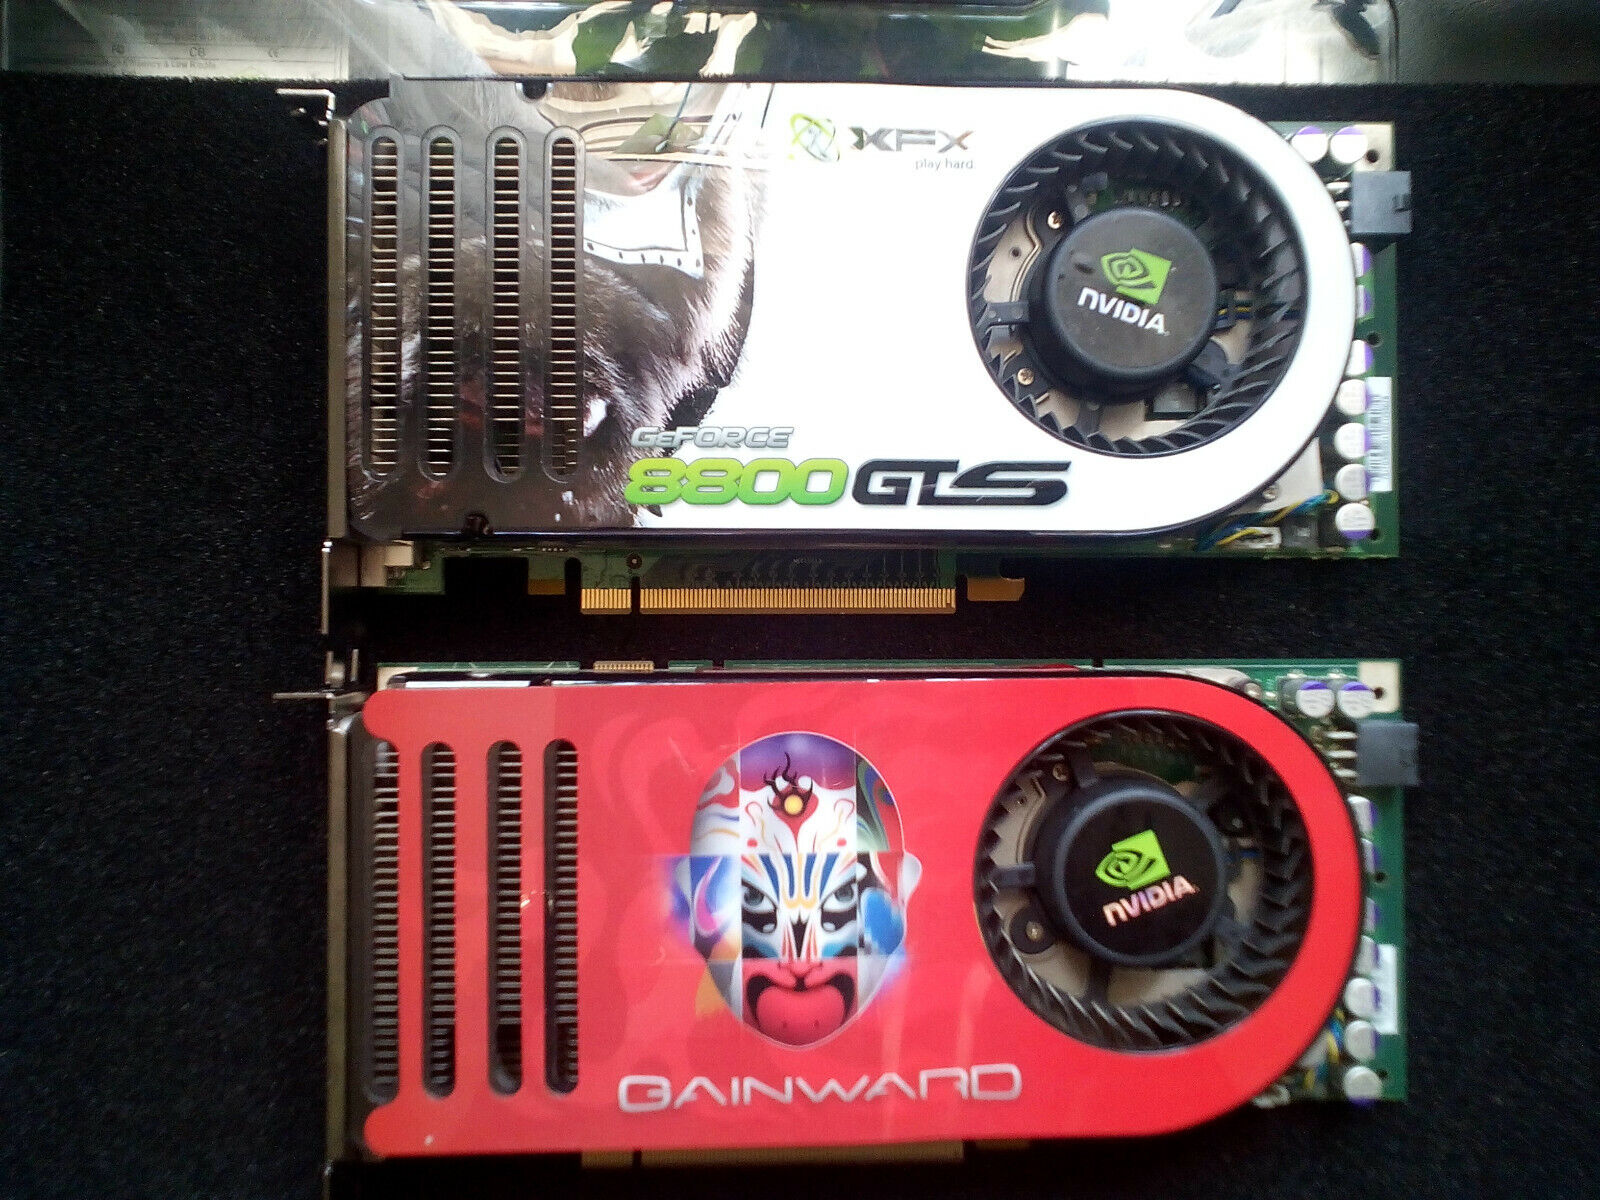 2 x Nvidea GeForce 8800 GTS (640 MB) (471846200-8279) PCIe Grafikkarte TOP